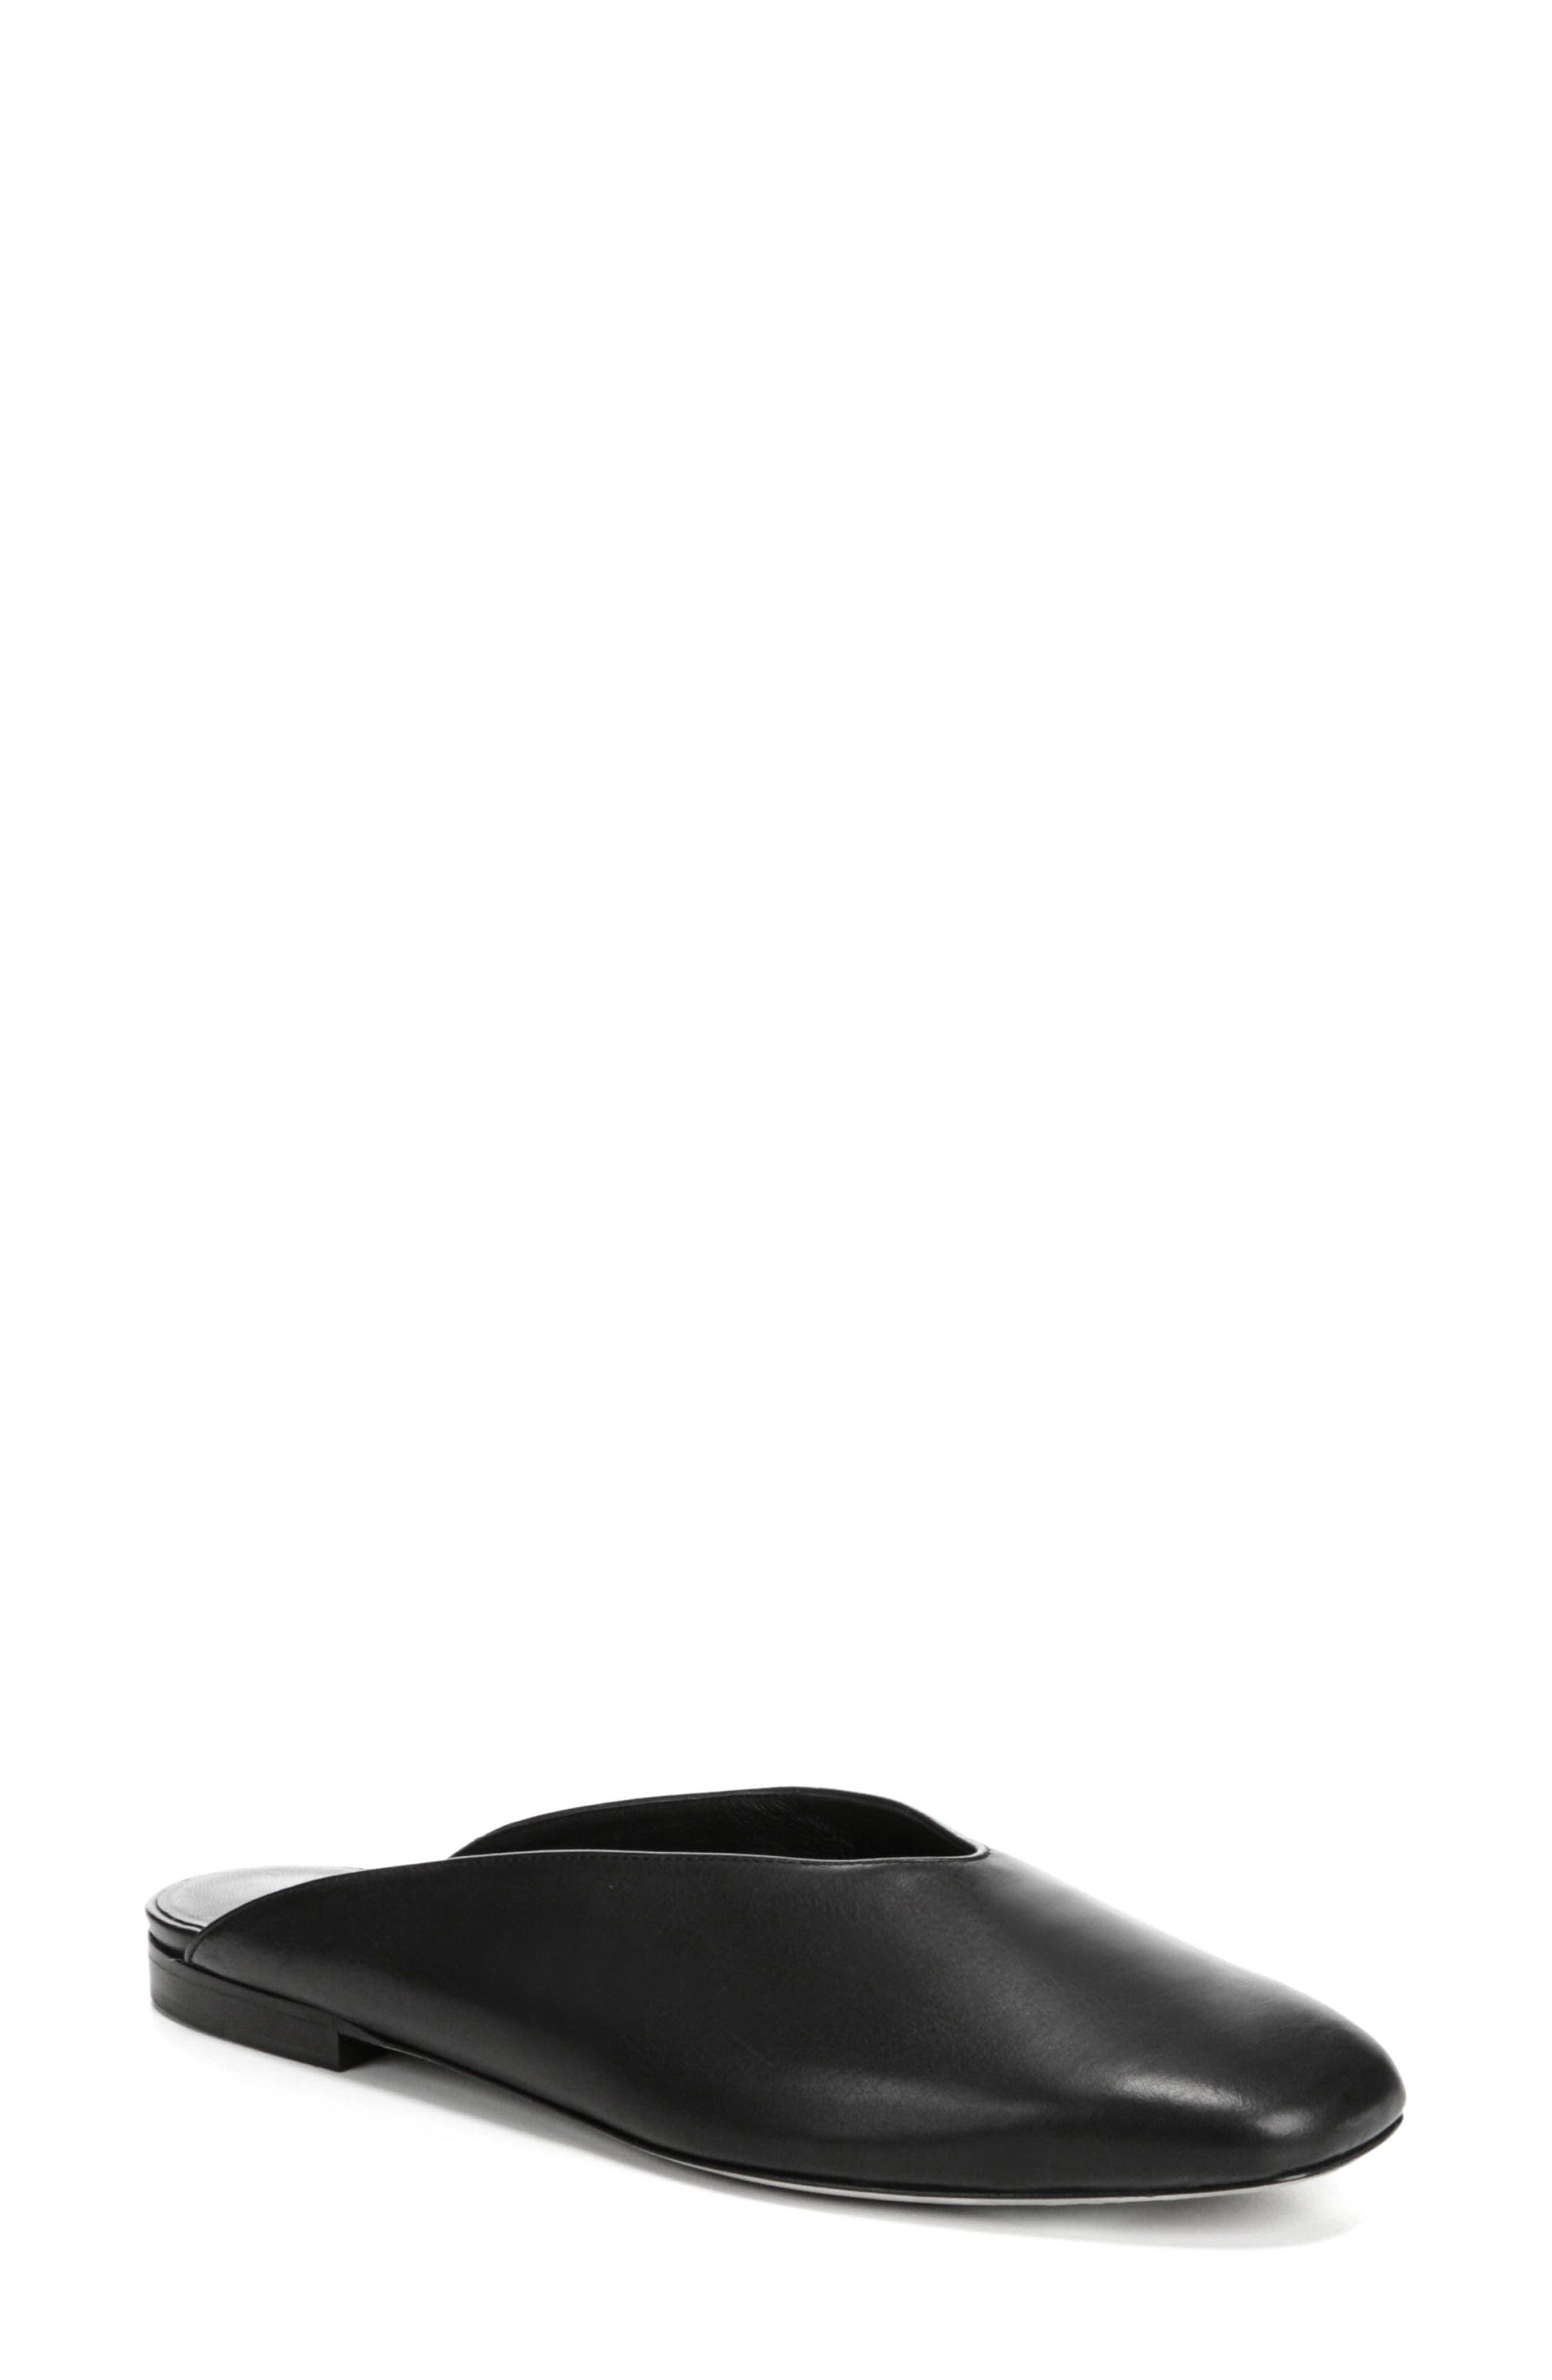 Levins V-Cut Mule,                             Main thumbnail 1, color,                             BLACK